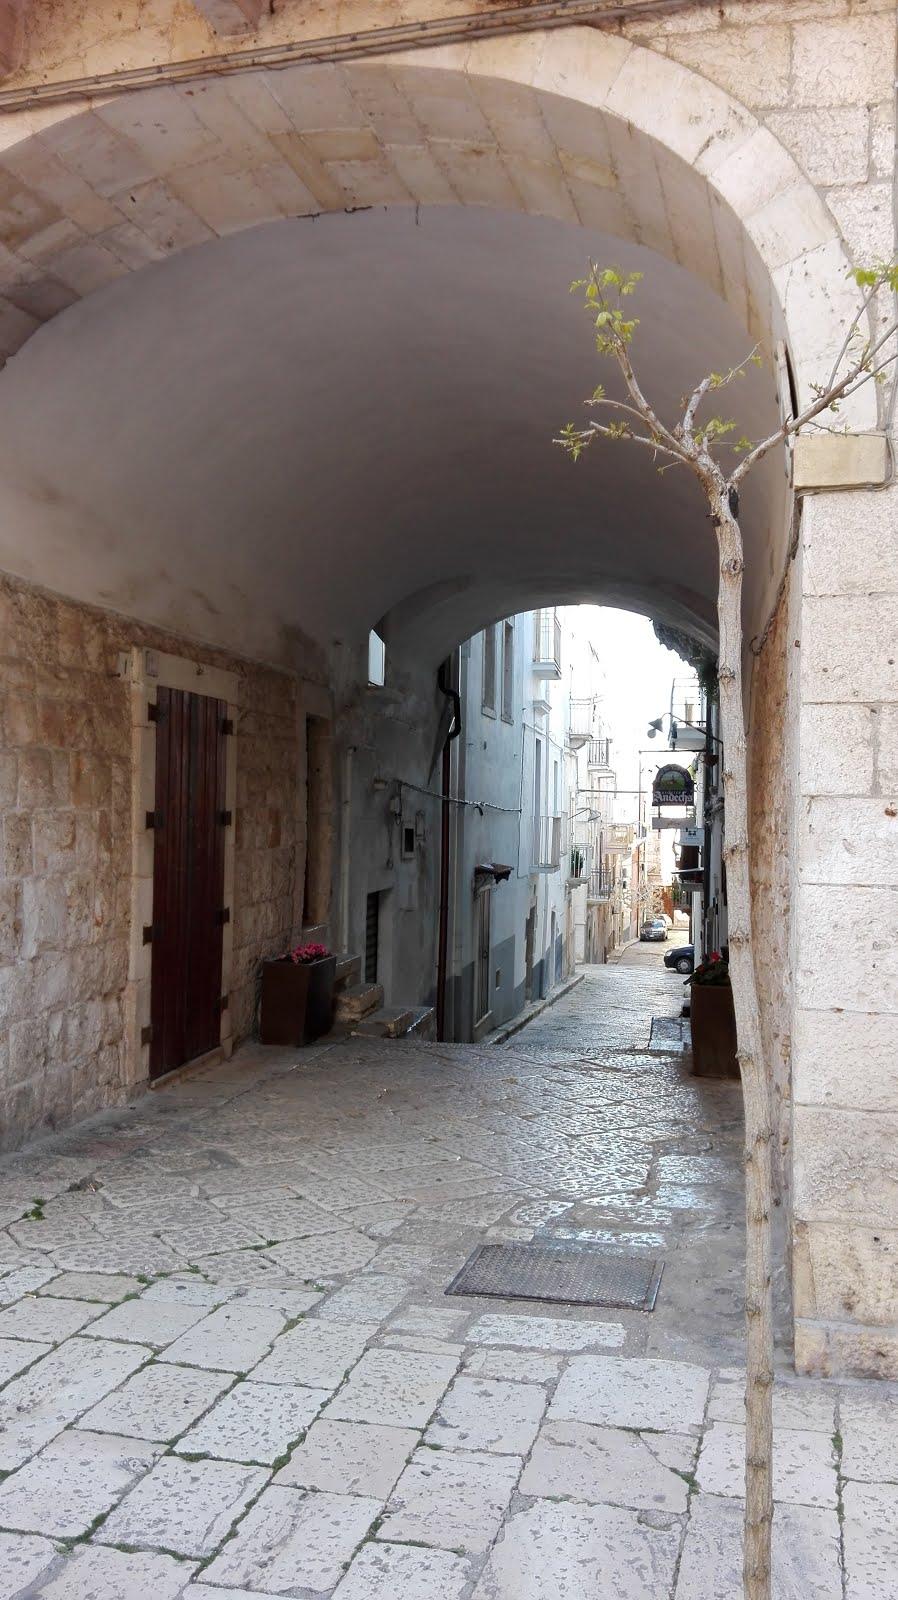 castellana grotte 5